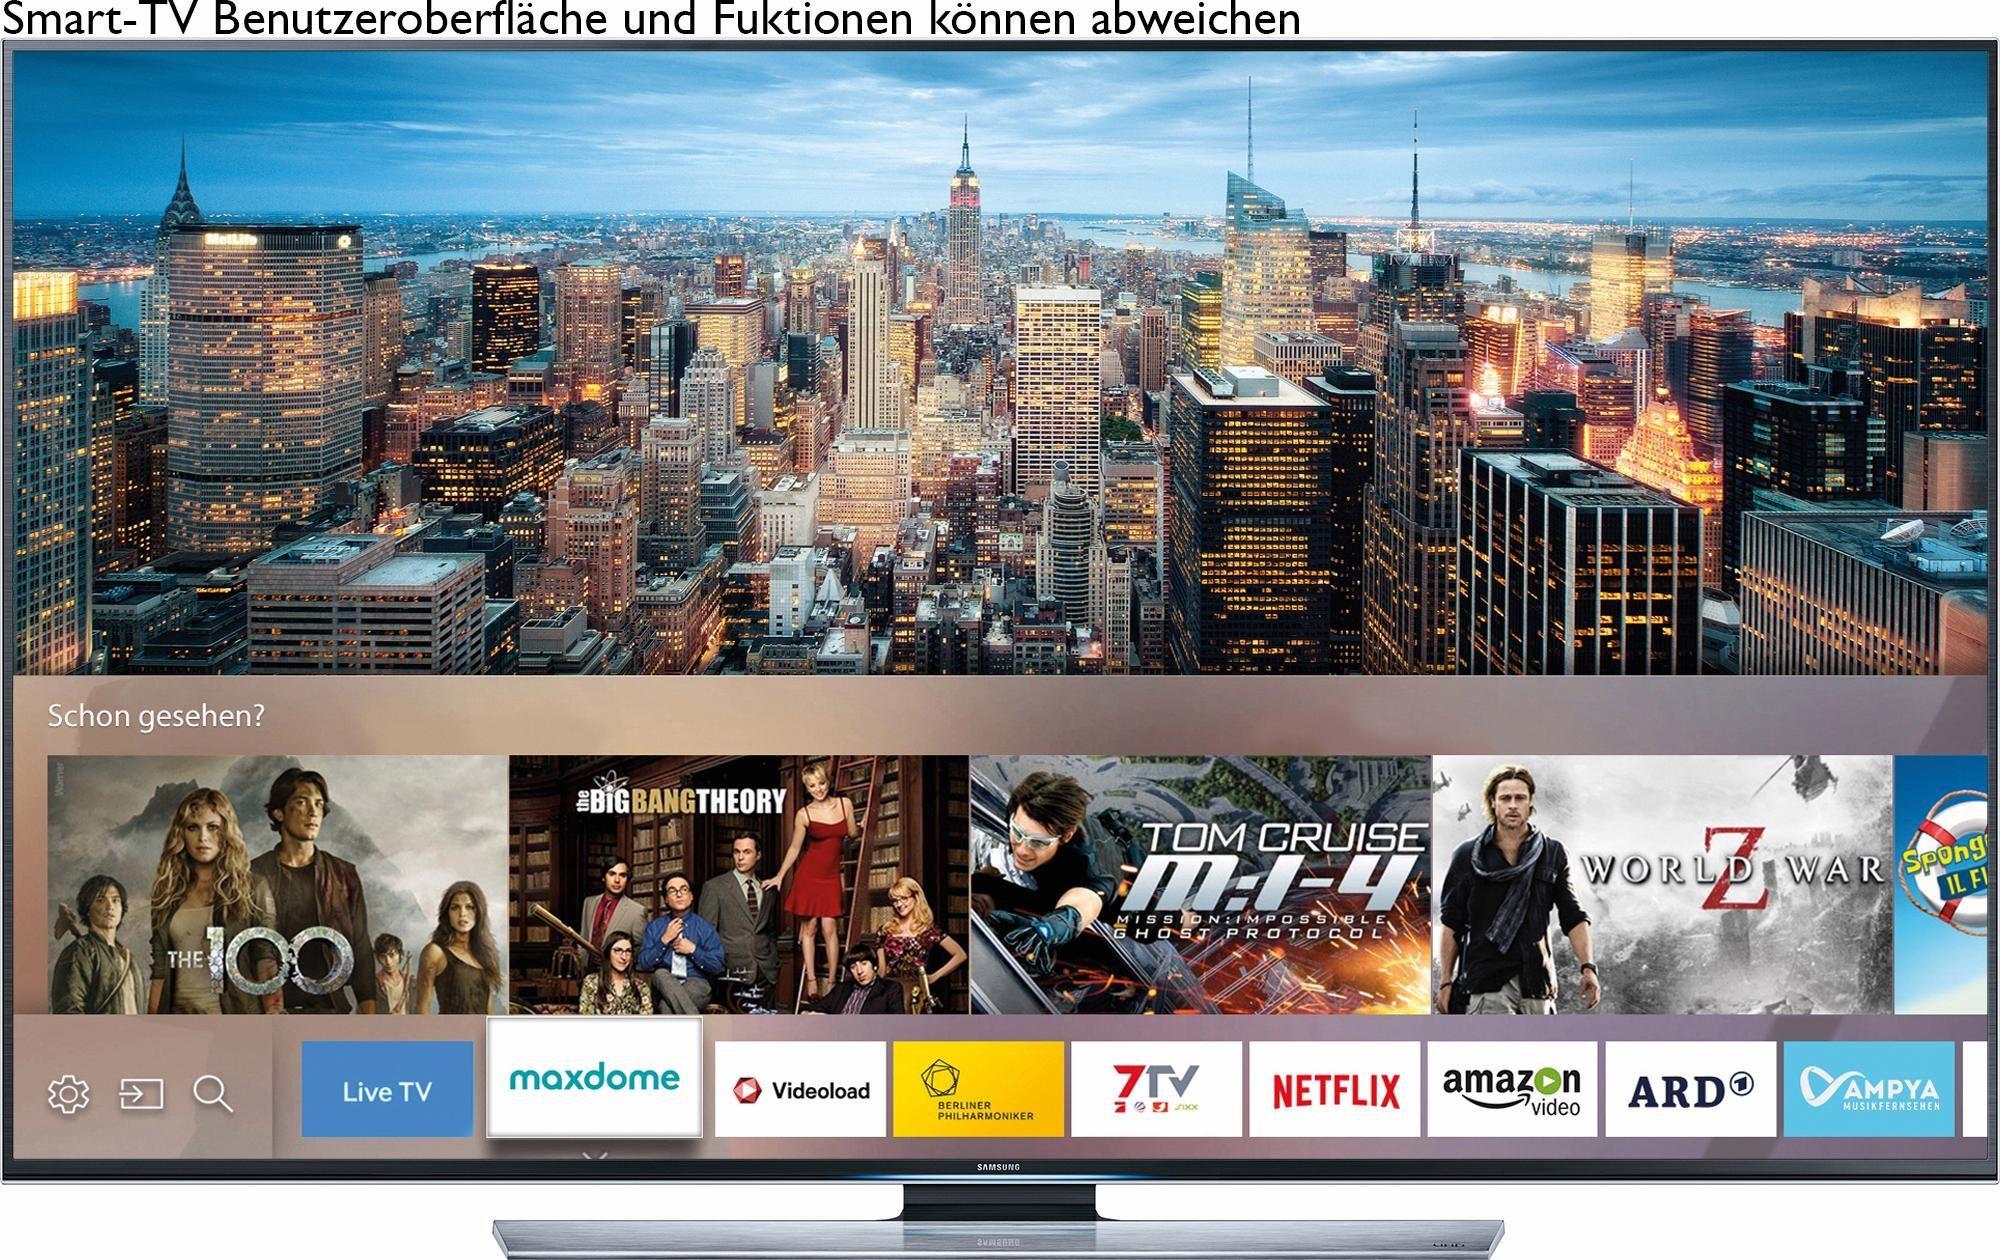 Samsung UE85JU7090, LED Fernseher, 214 cm (85 Zoll), 2160p (4K Ultra HD), Smart-TV